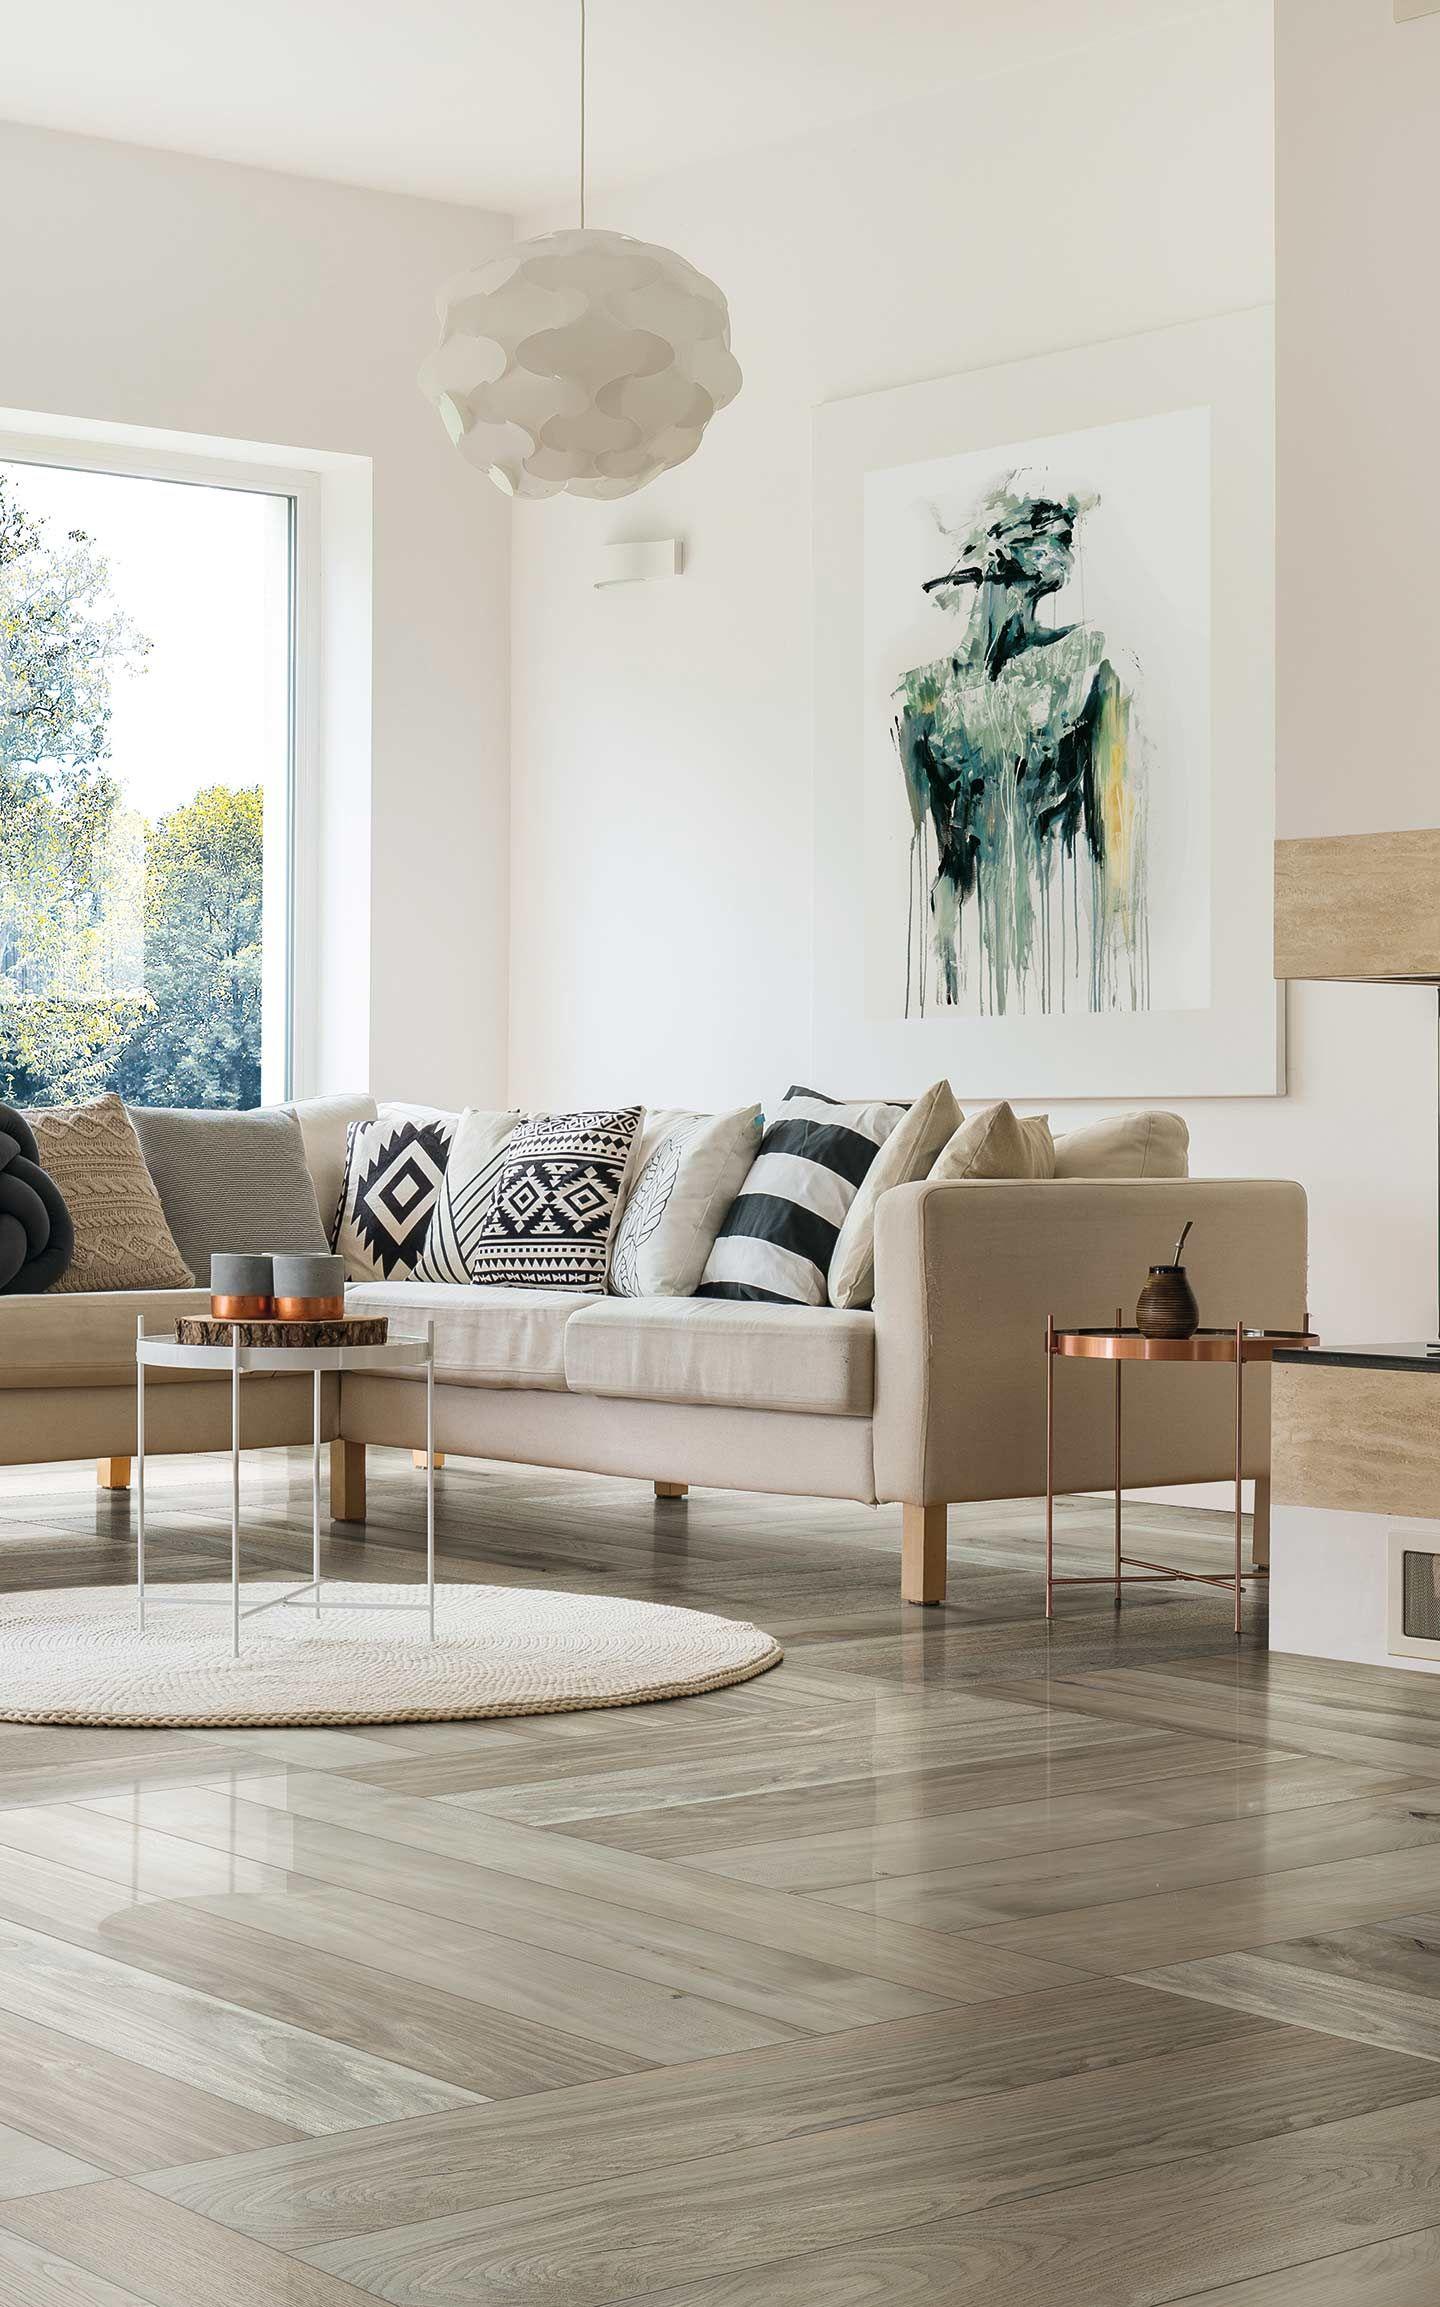 Hi Wood Reinterprets Wood Through A Modern Design With Li